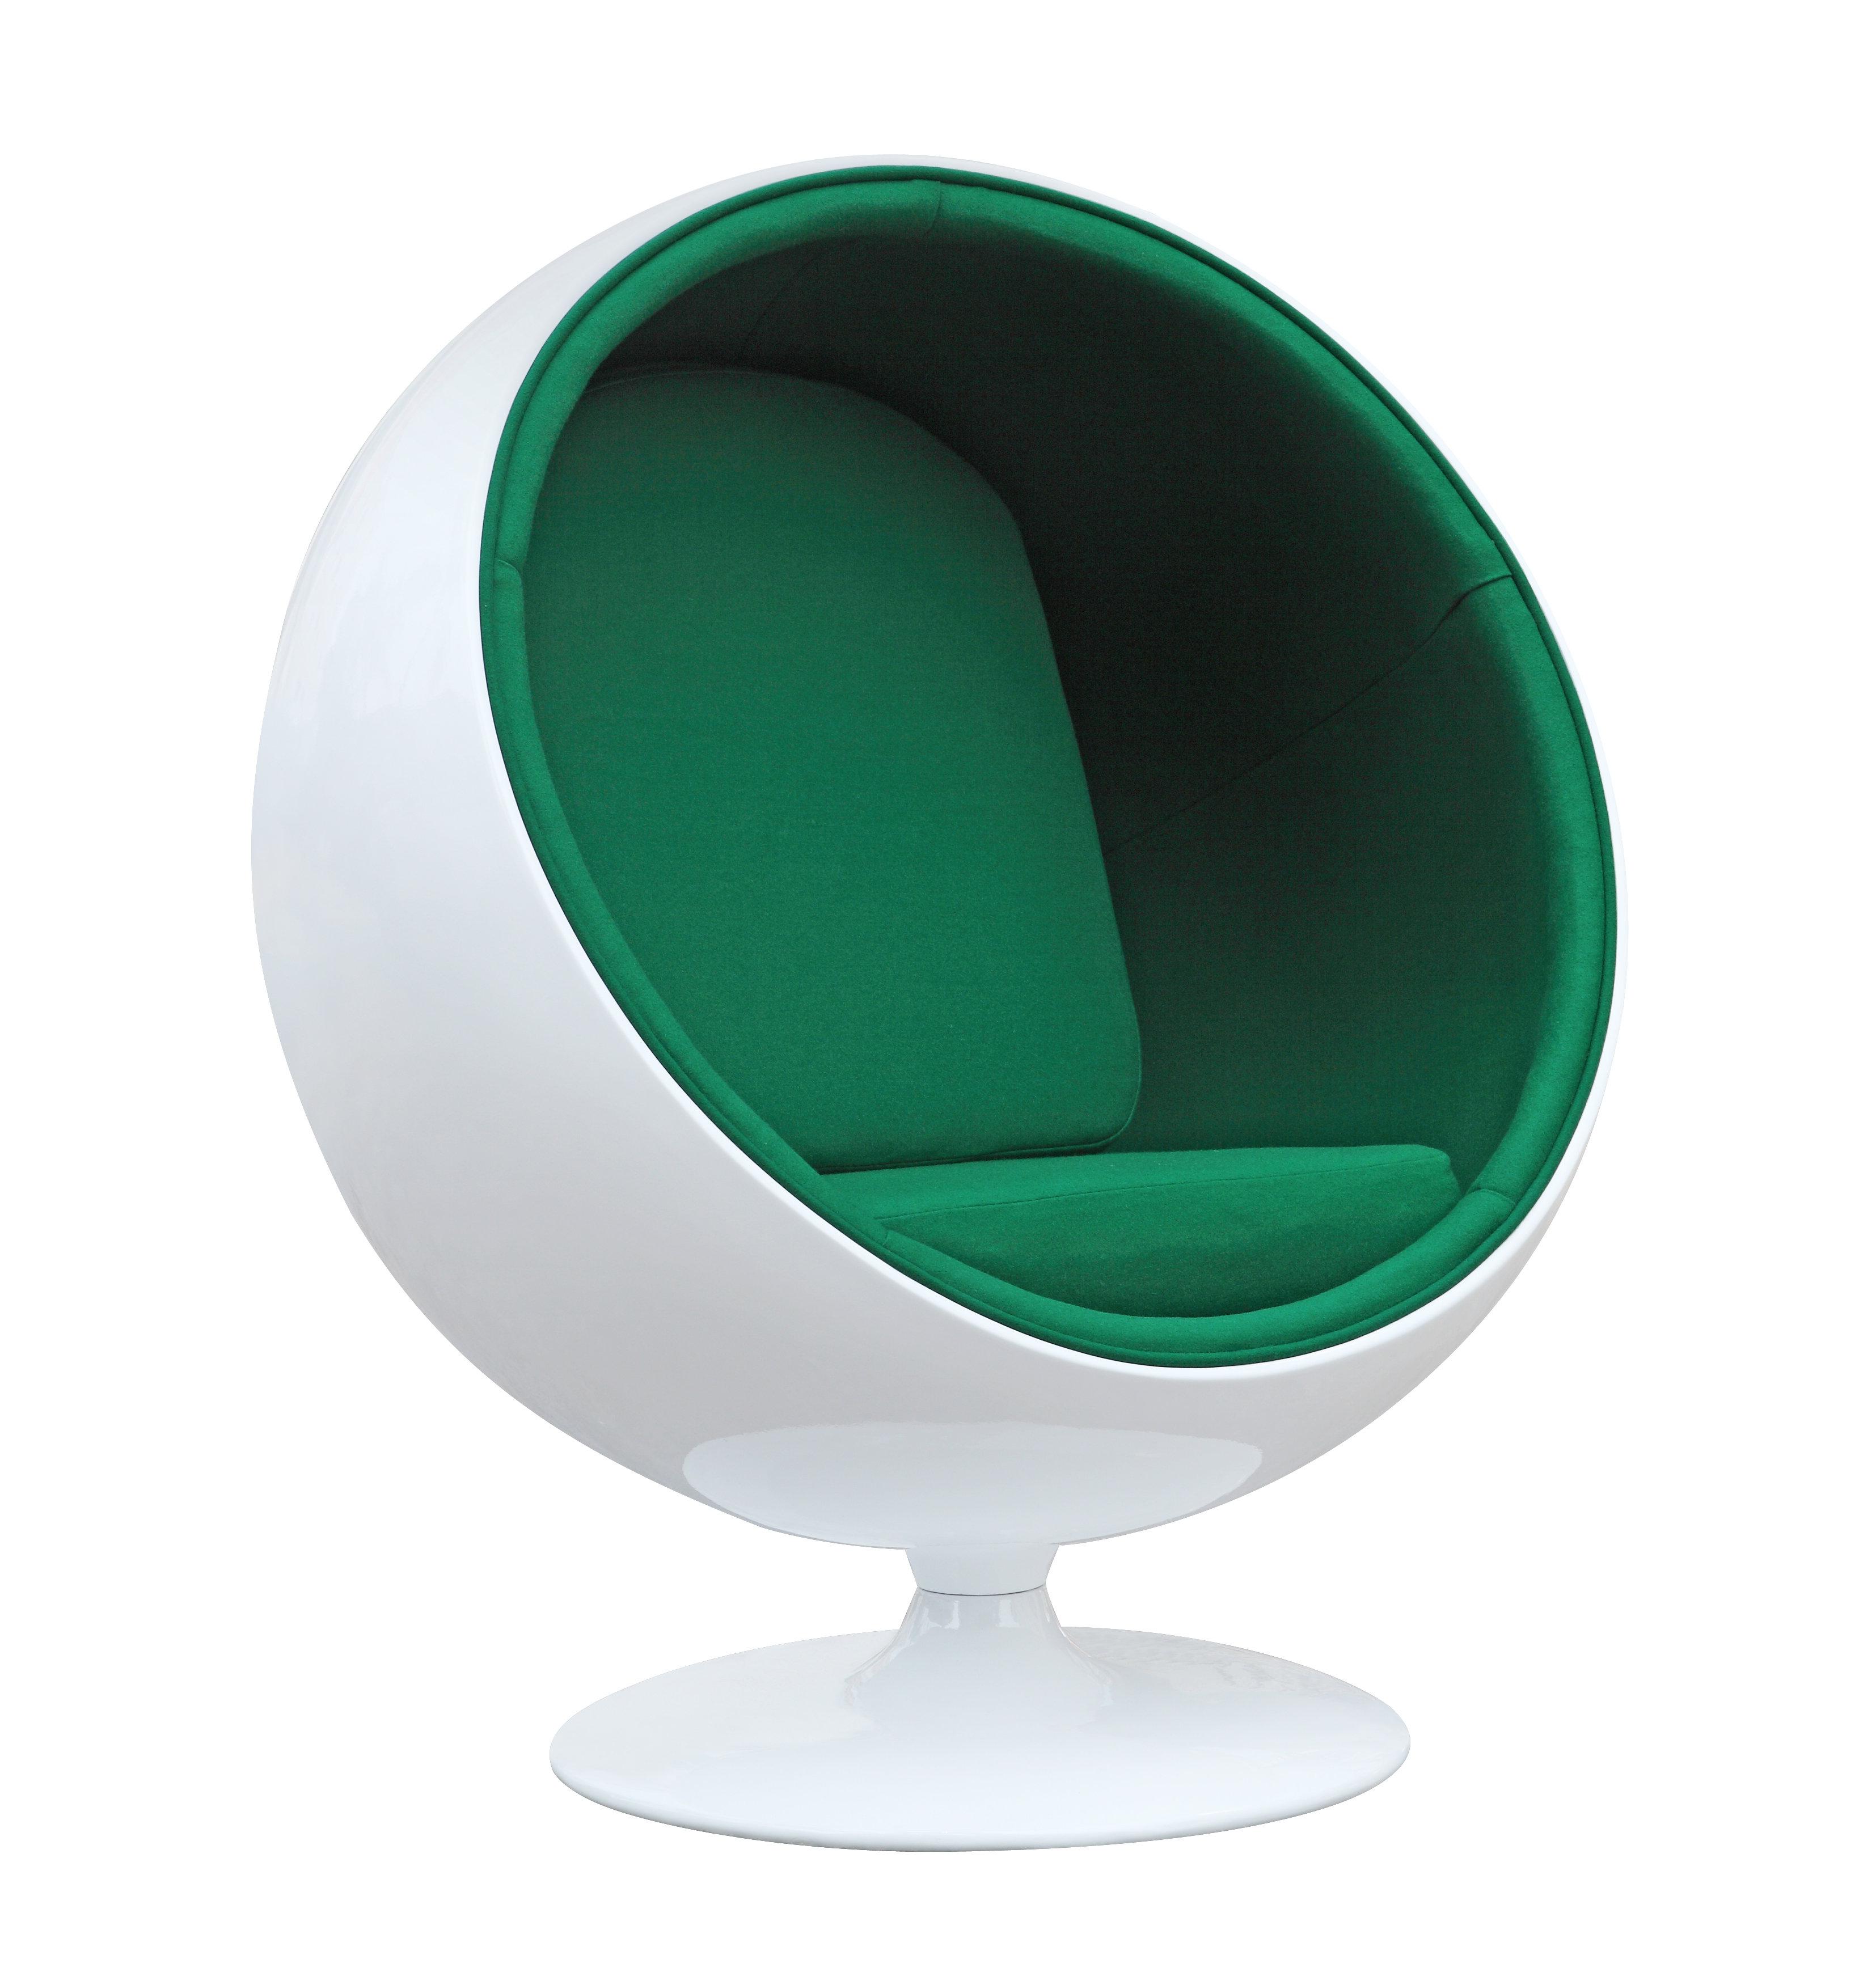 Exceptionnel Fine Mod Imports Ball Balloon Chair U0026 Reviews | Wayfair